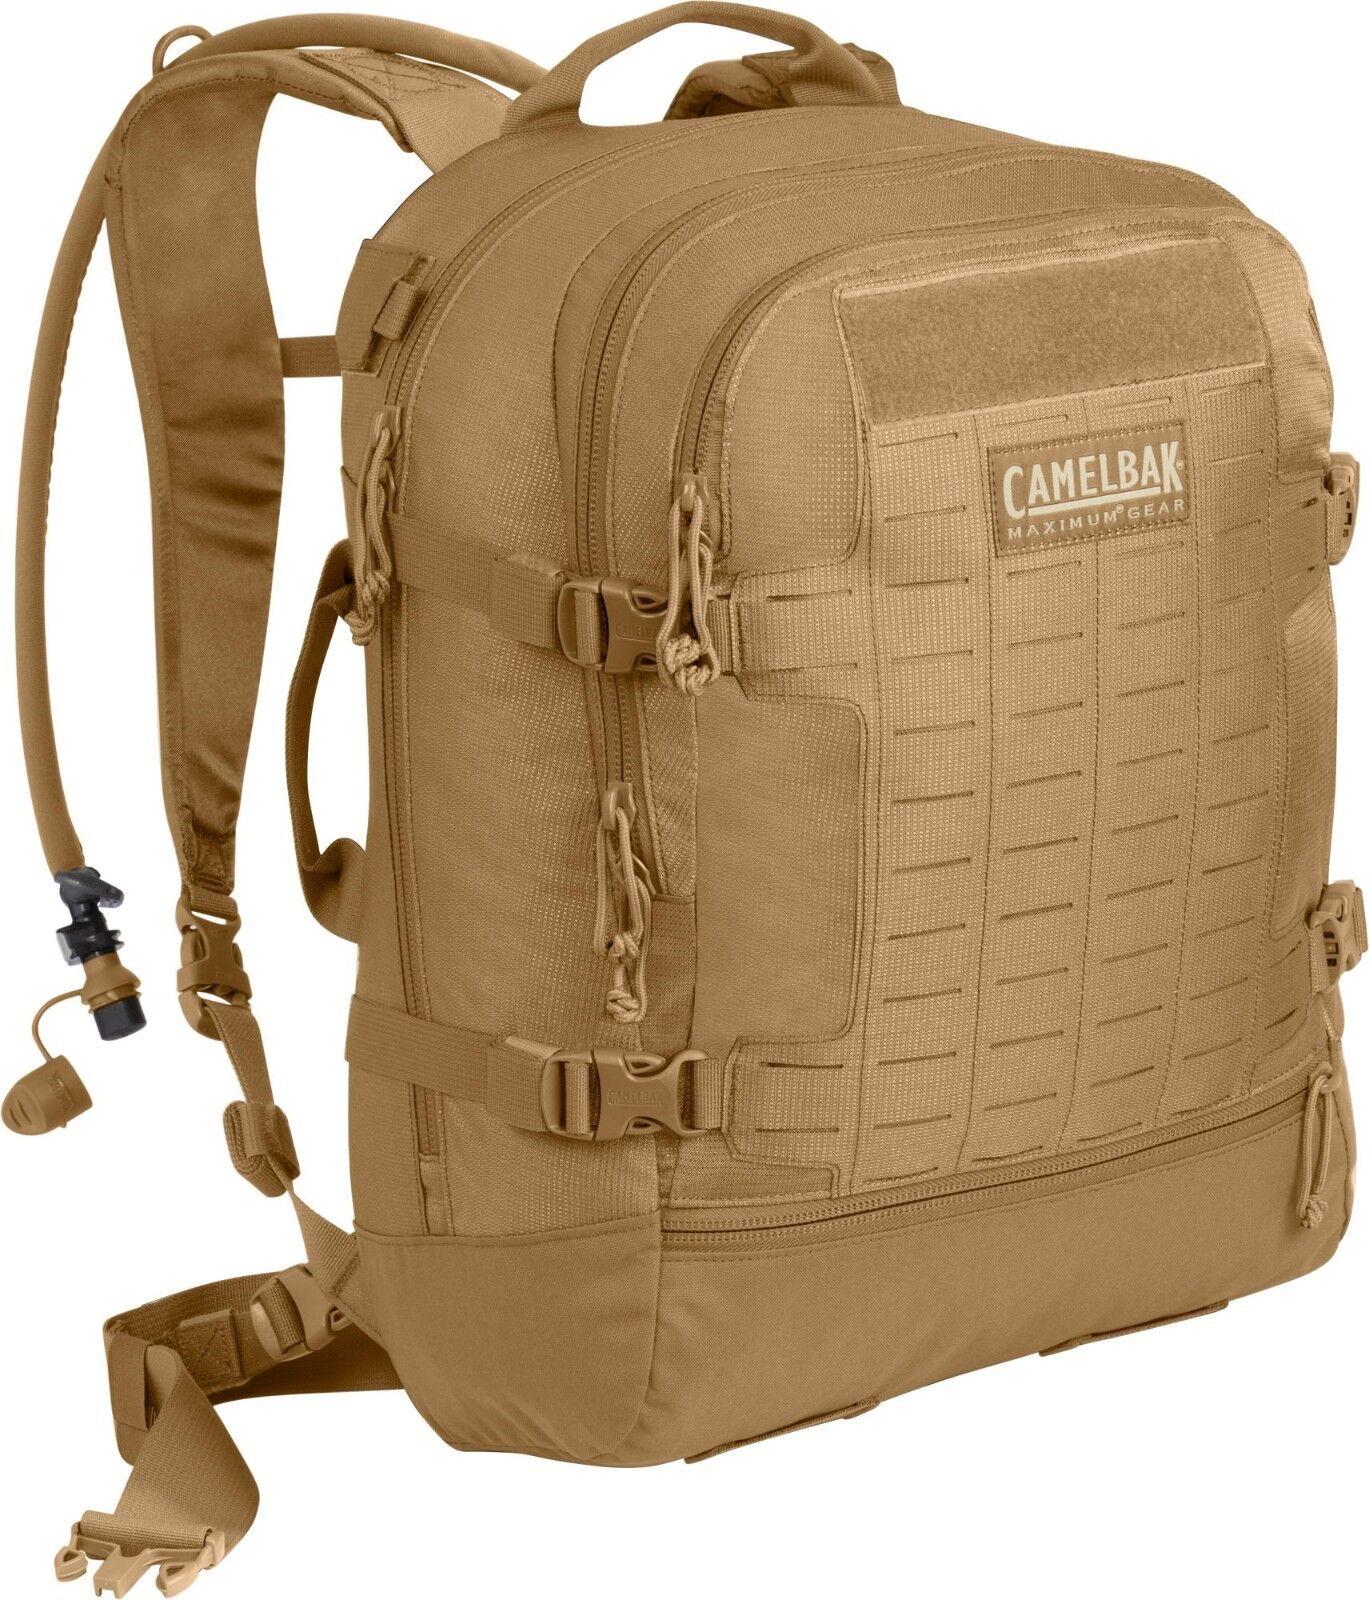 Camelbak escaramuza 62479 100oz 3L Mil Spec Antidote Hidratación Coyote + paquete de carga